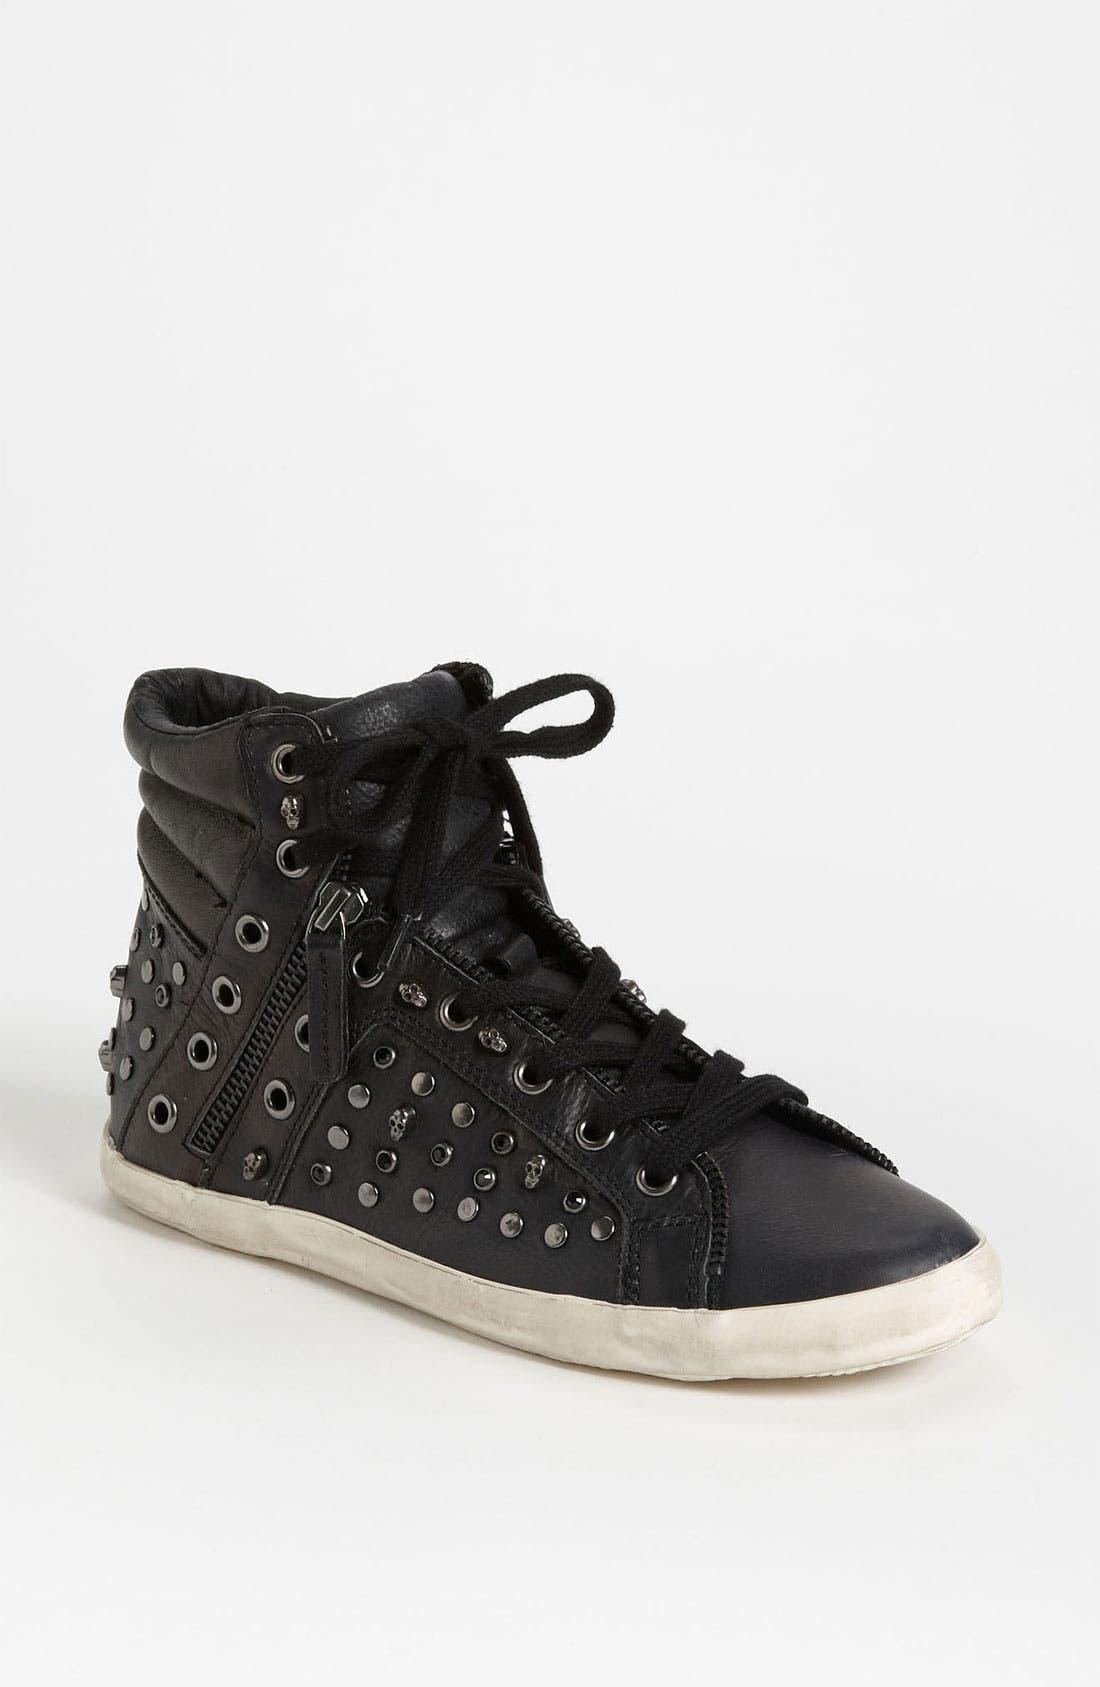 Alternate Image 1 Selected - Ash 'Stella' Sneaker (Online Only)